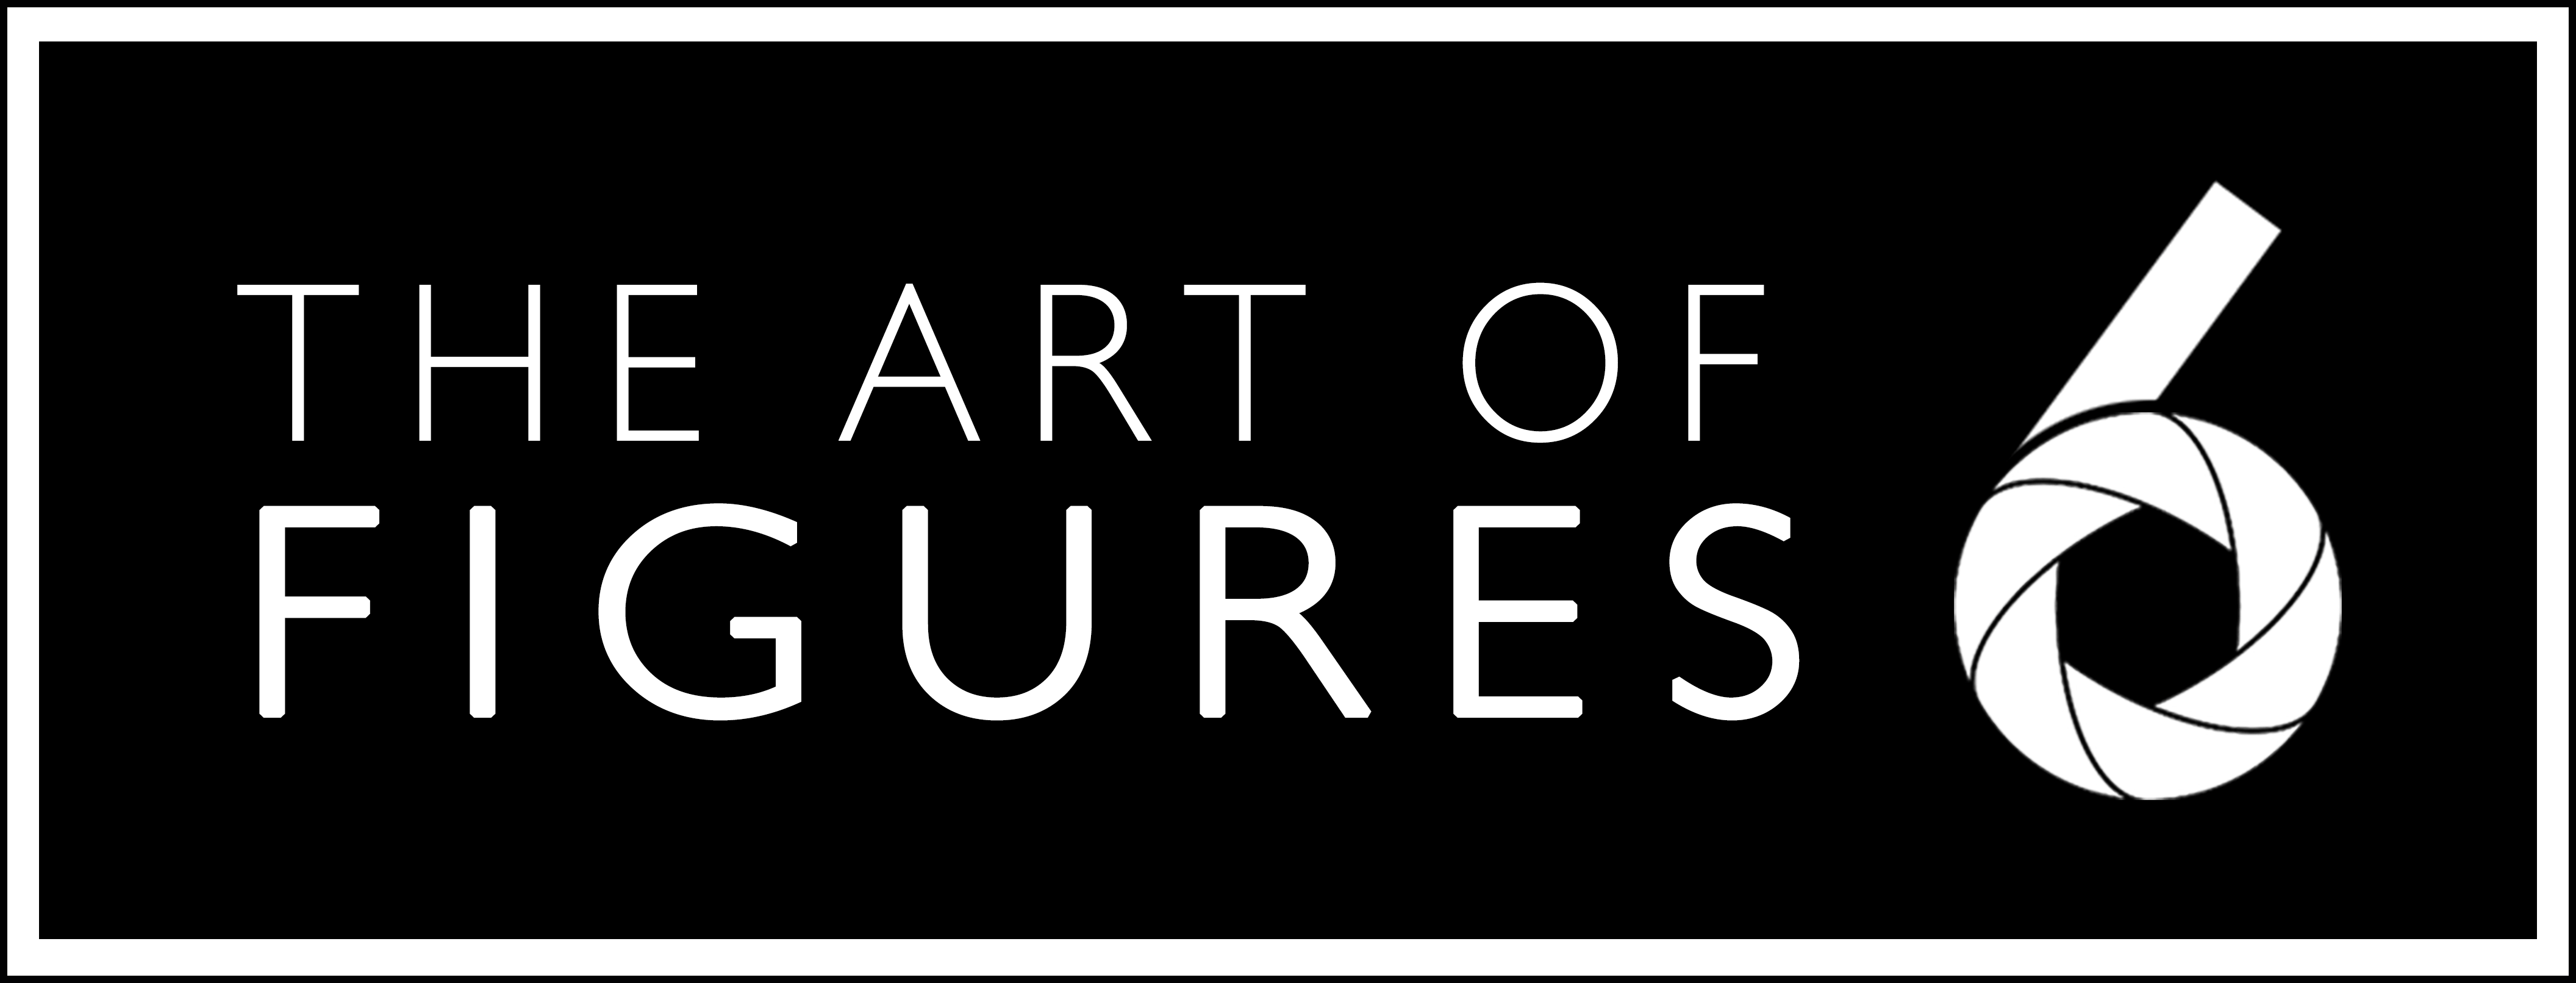 The Art of Six Figures